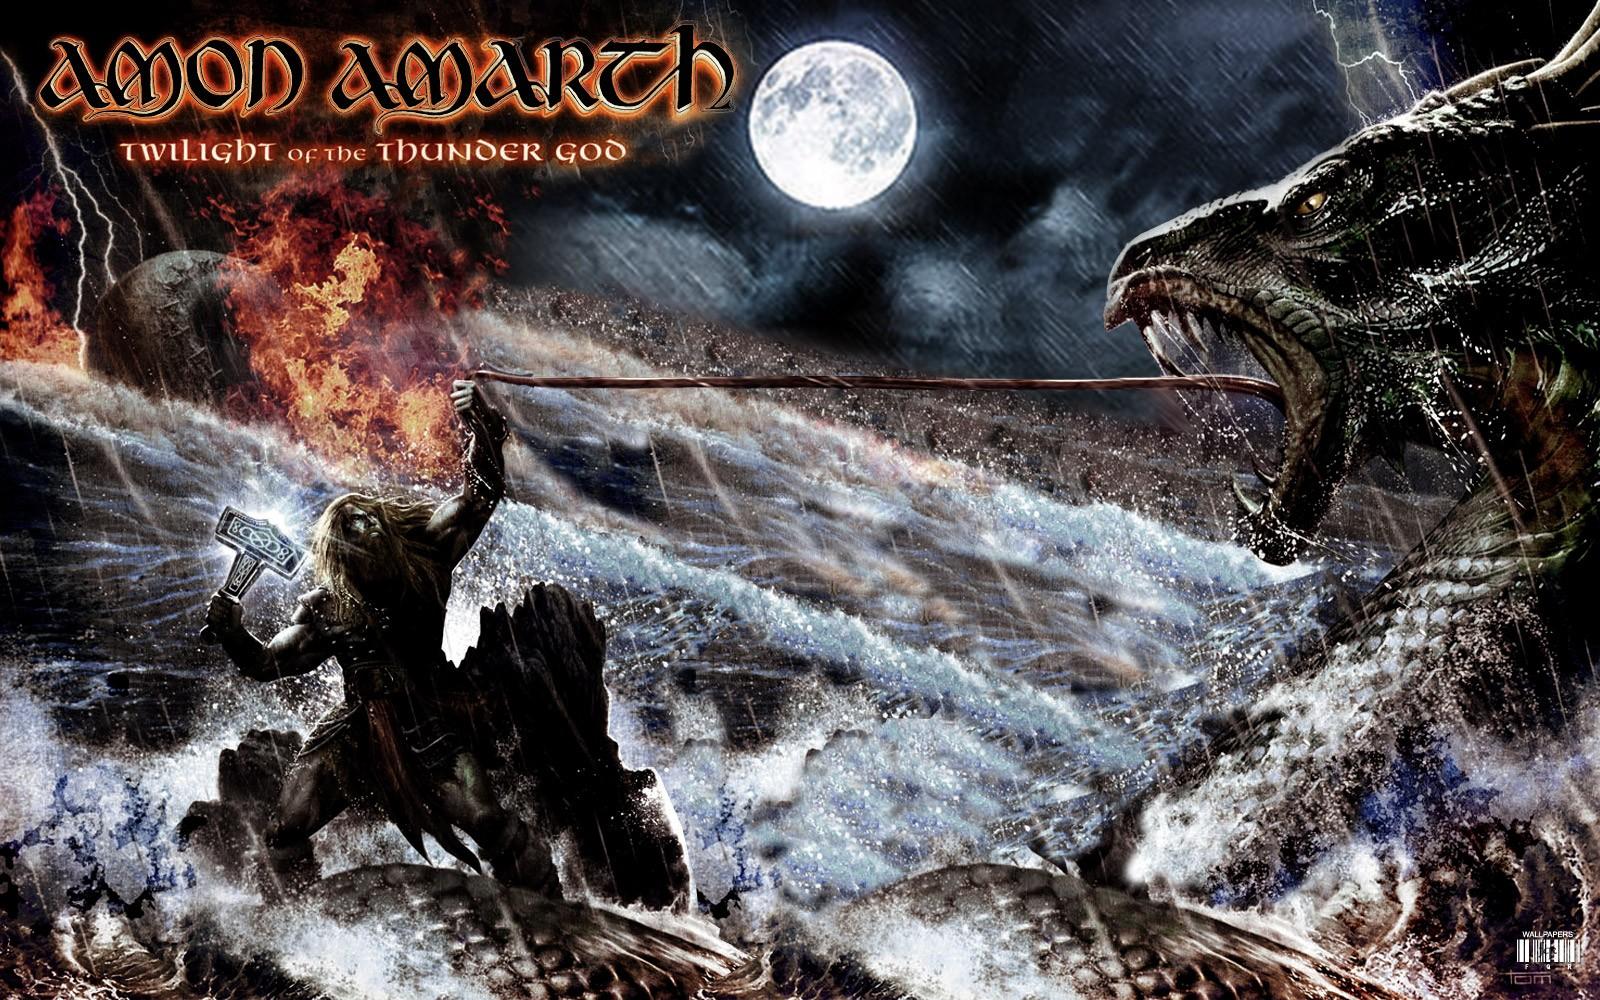 General 1600x1000 Amon Amarth melodic death metal Vikings battle warrior Fantasy Battle digital art fantasy art death metal medieval rock bands music cover art album covers